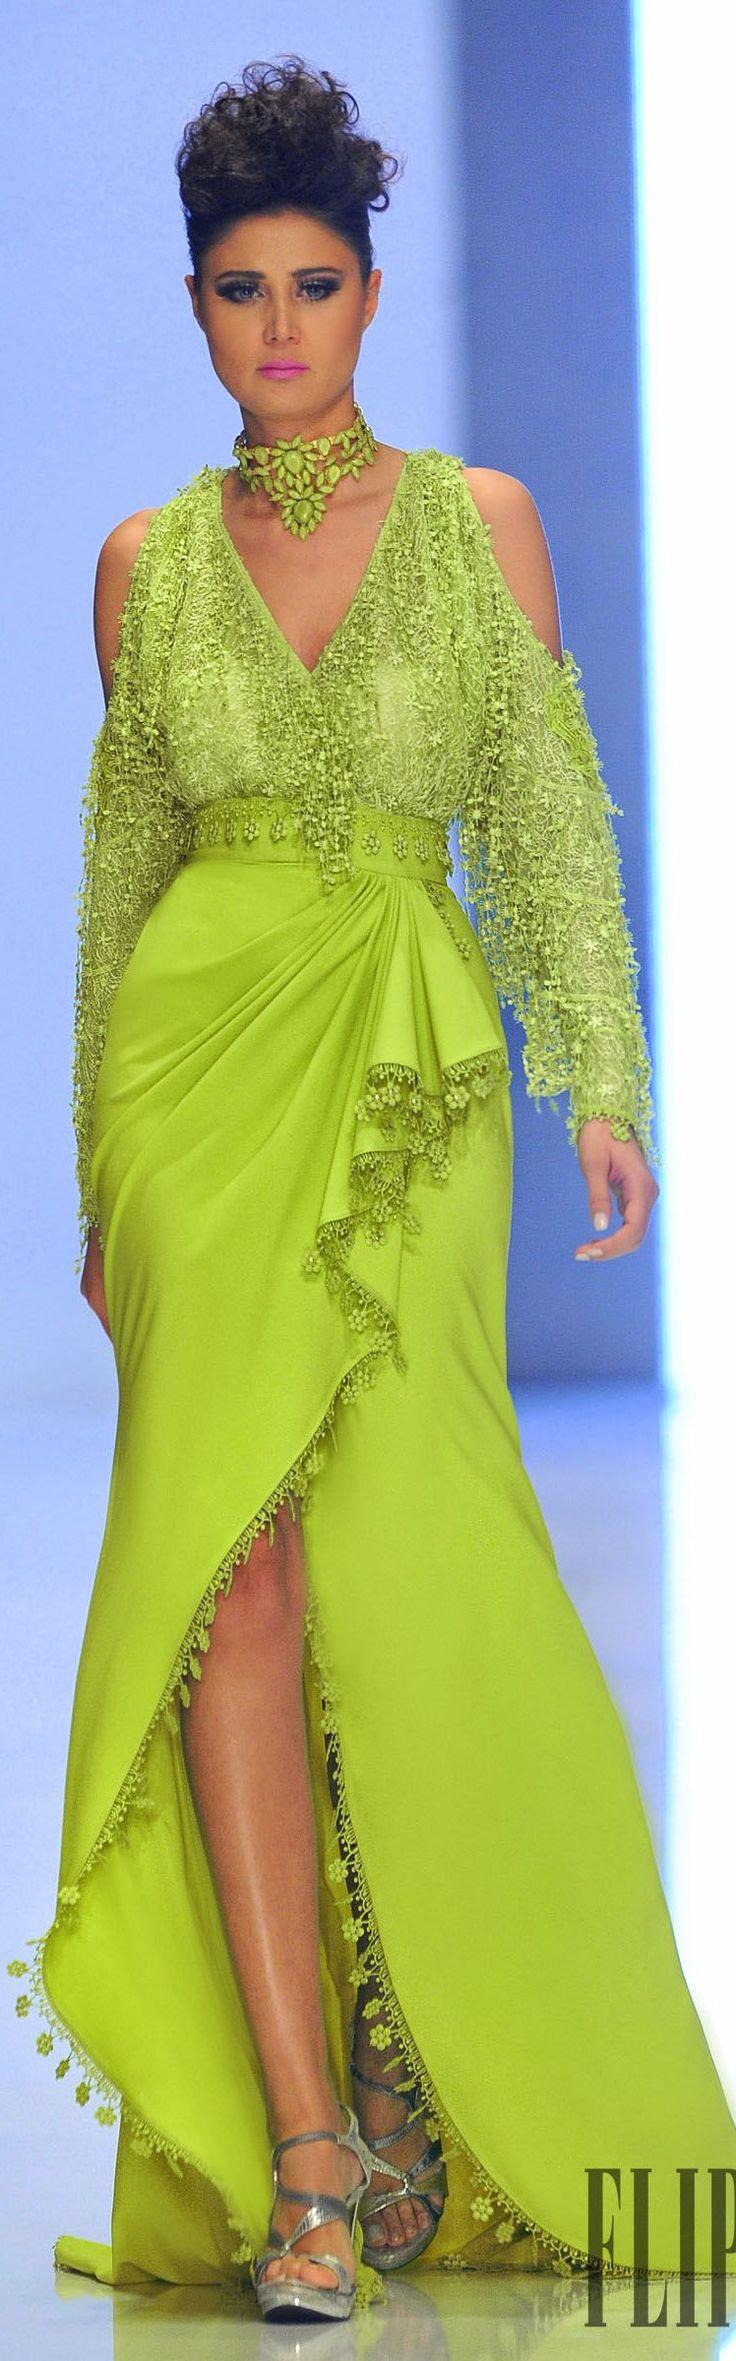 TD ❤️ Fouad Sarkis Spring-summer 2014 Couture - #Luxurydotcom